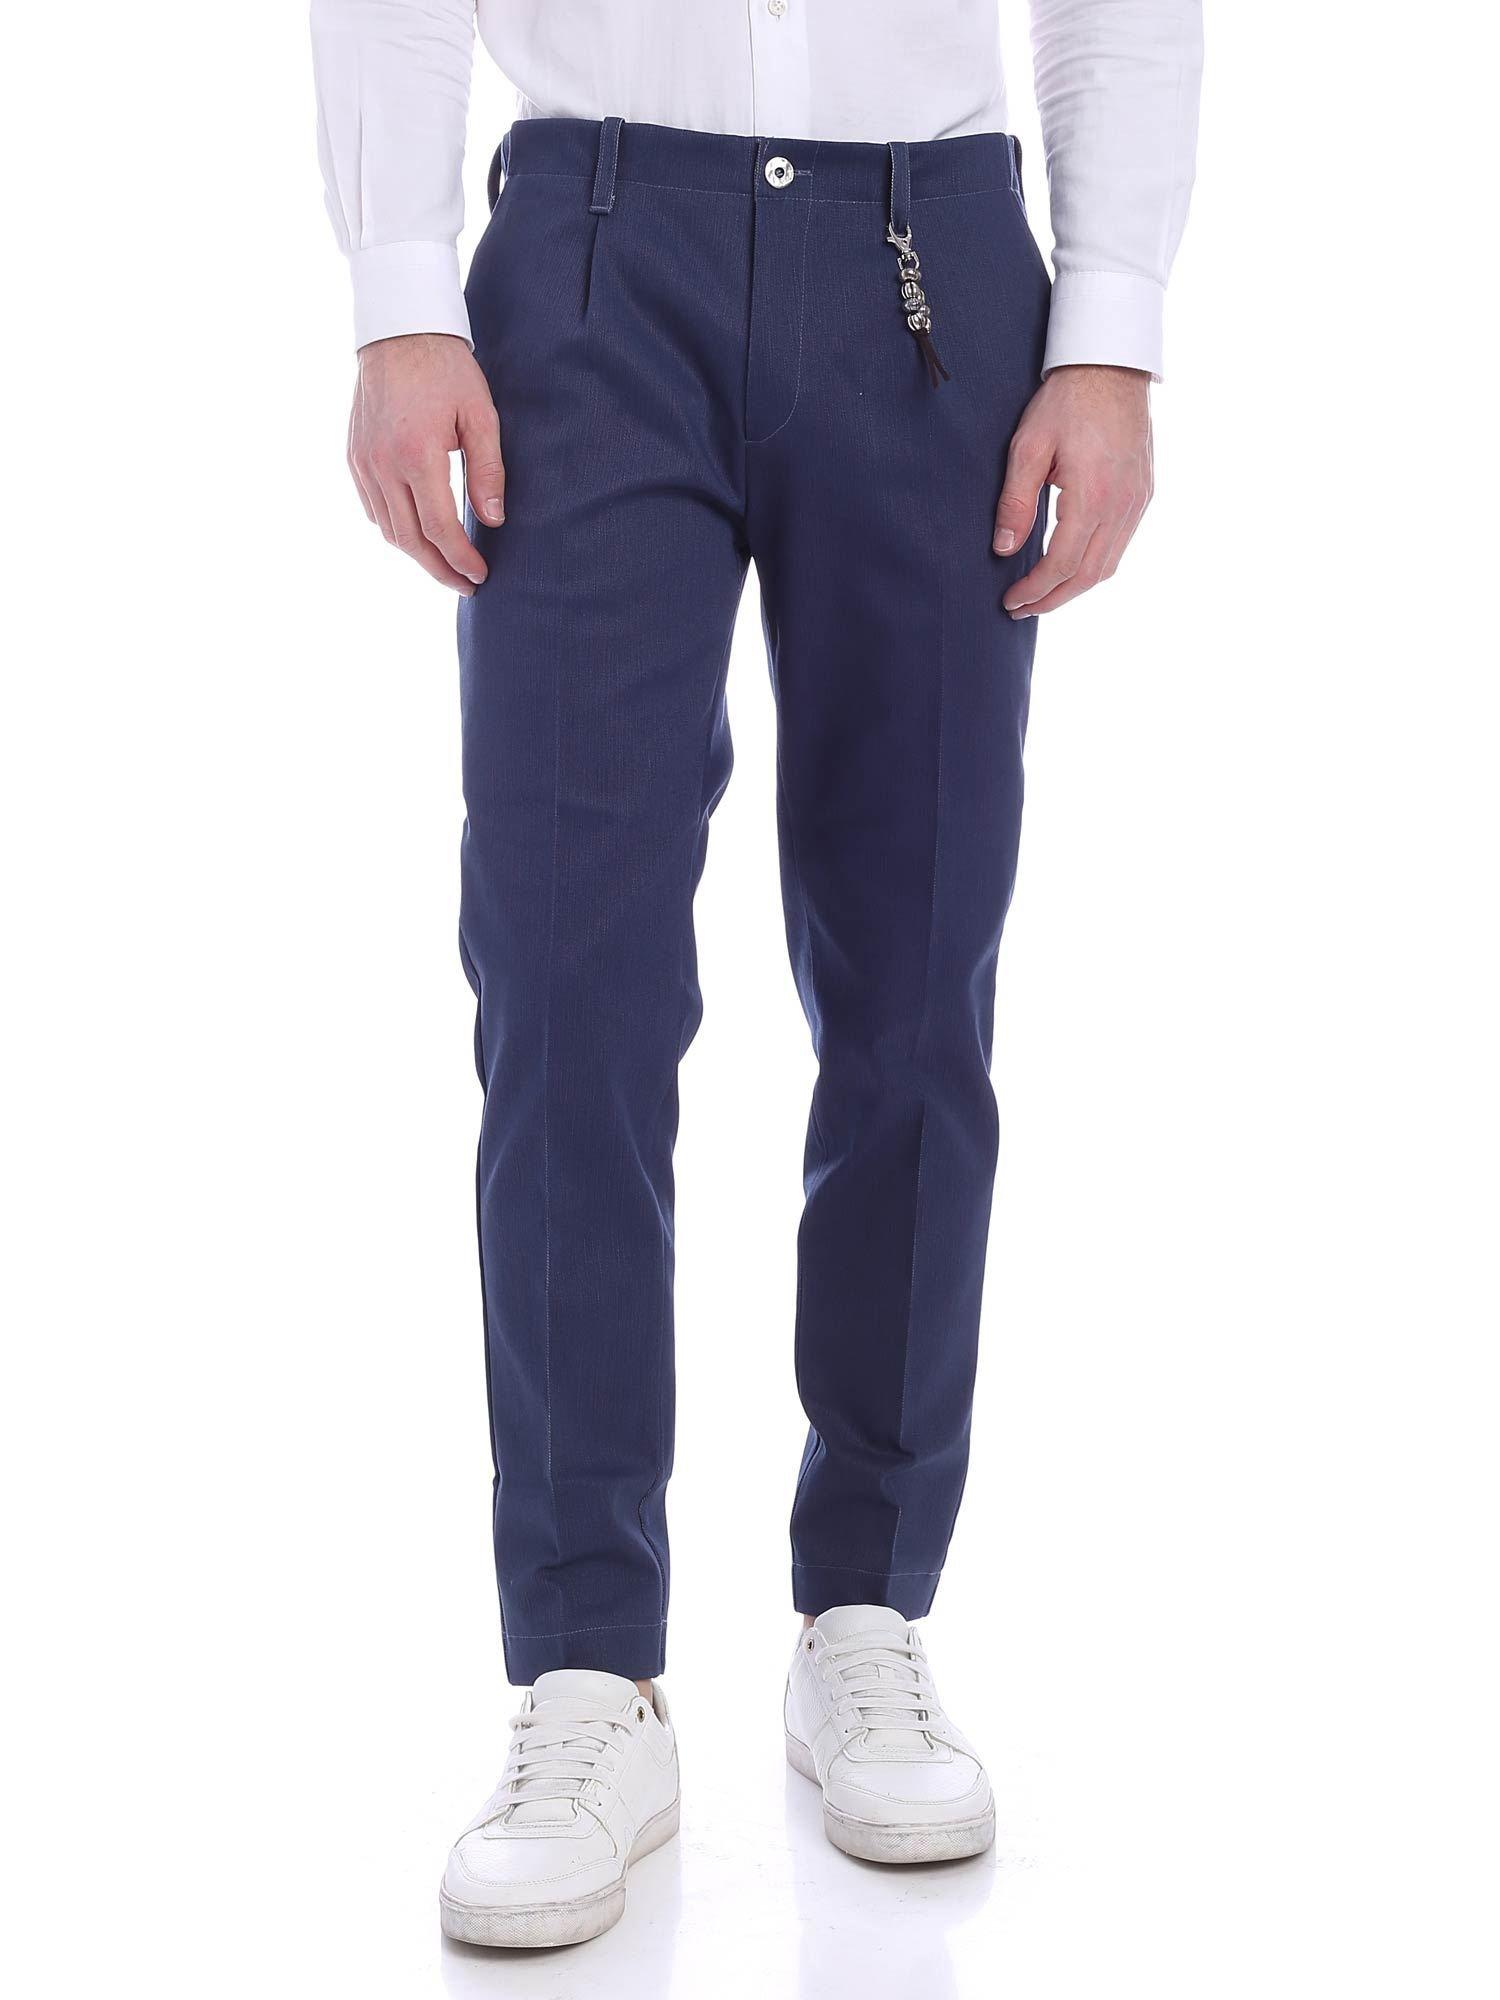 Image of Pantalone una pence denim blu R92 D-BL